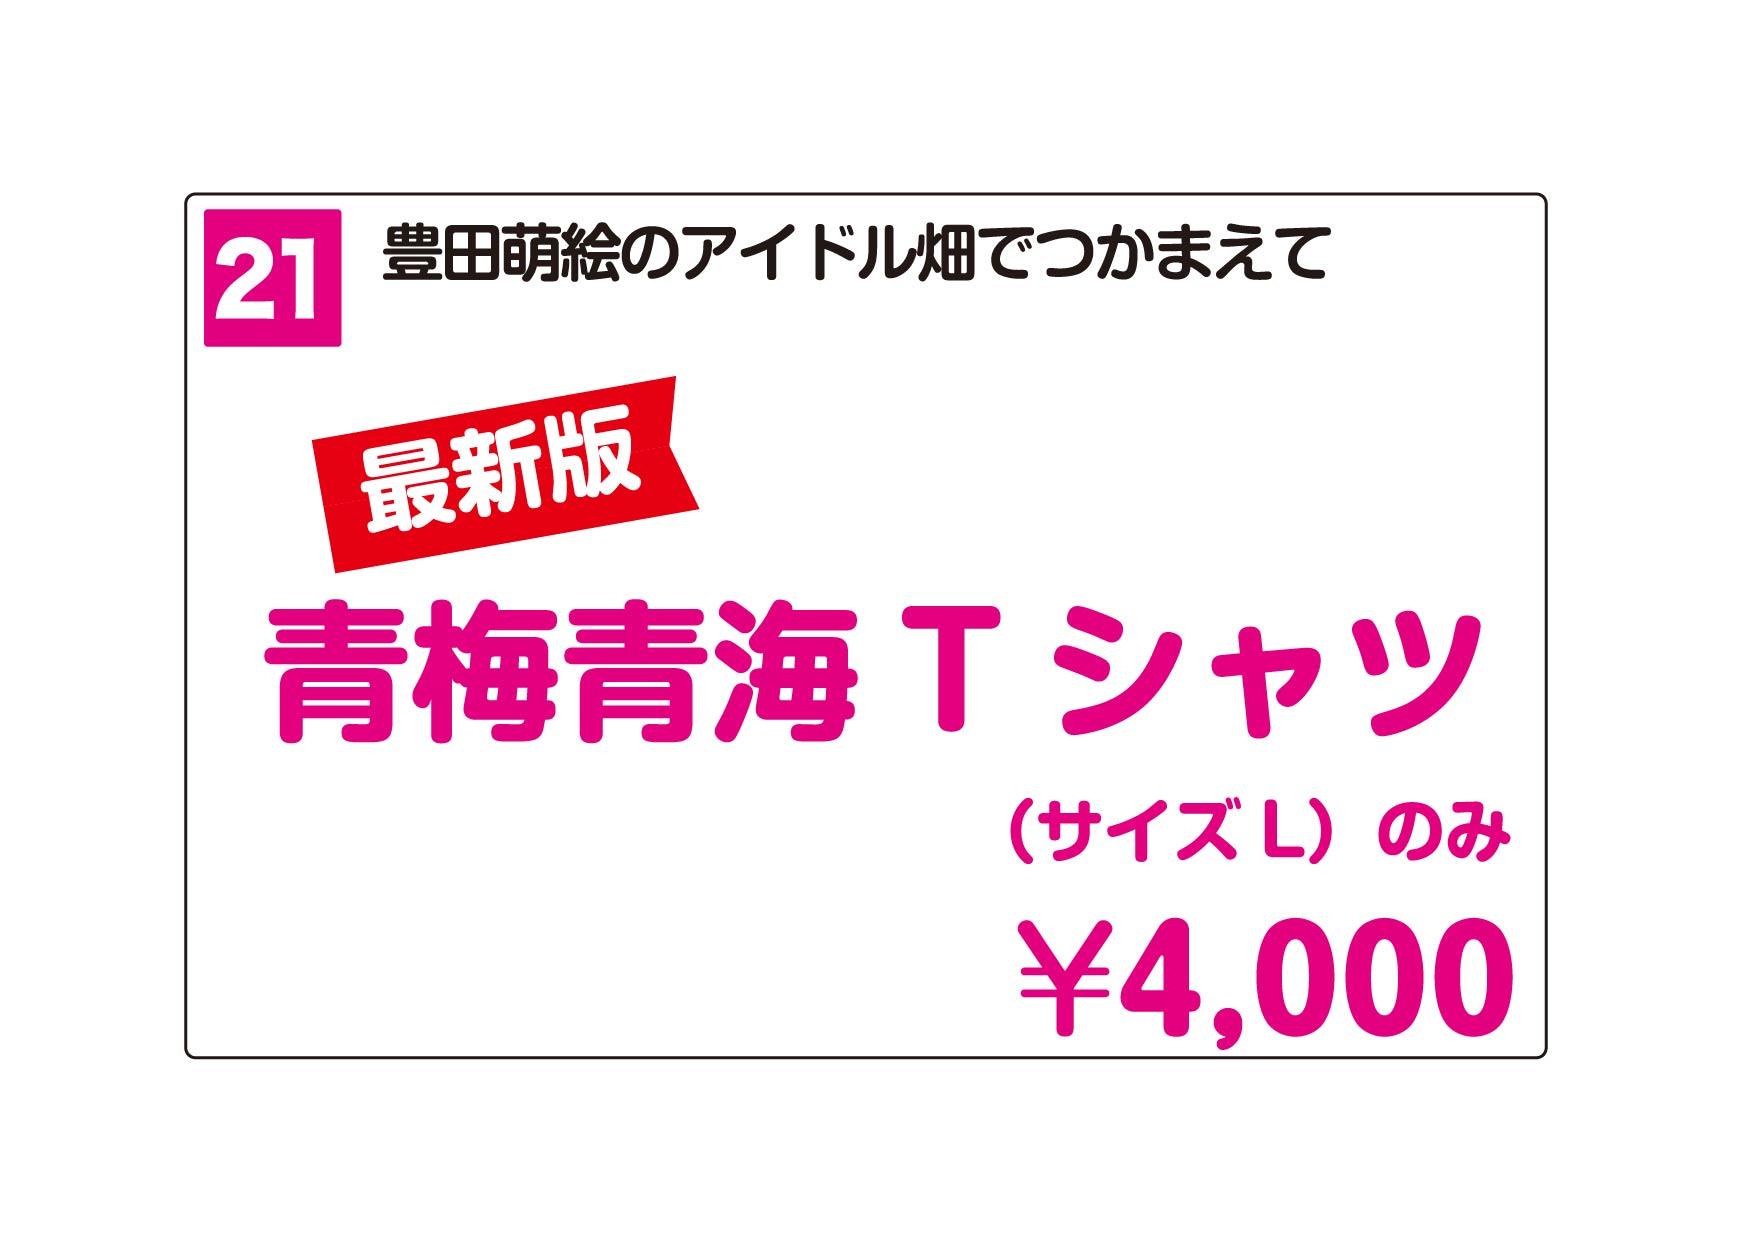 http://www.joqr.co.jp/AandG_booth/21.jpg